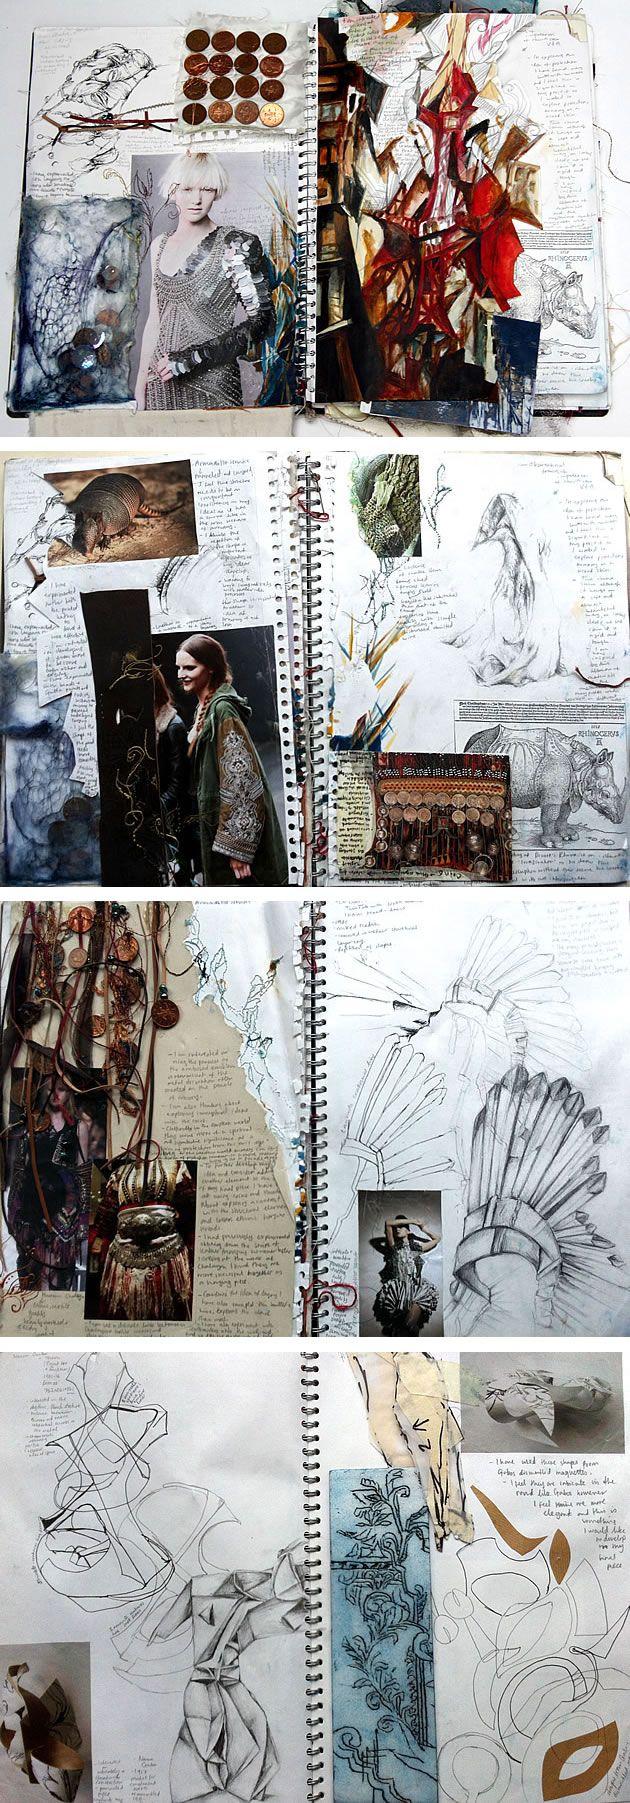 Halima's: A Levels textiles armour project